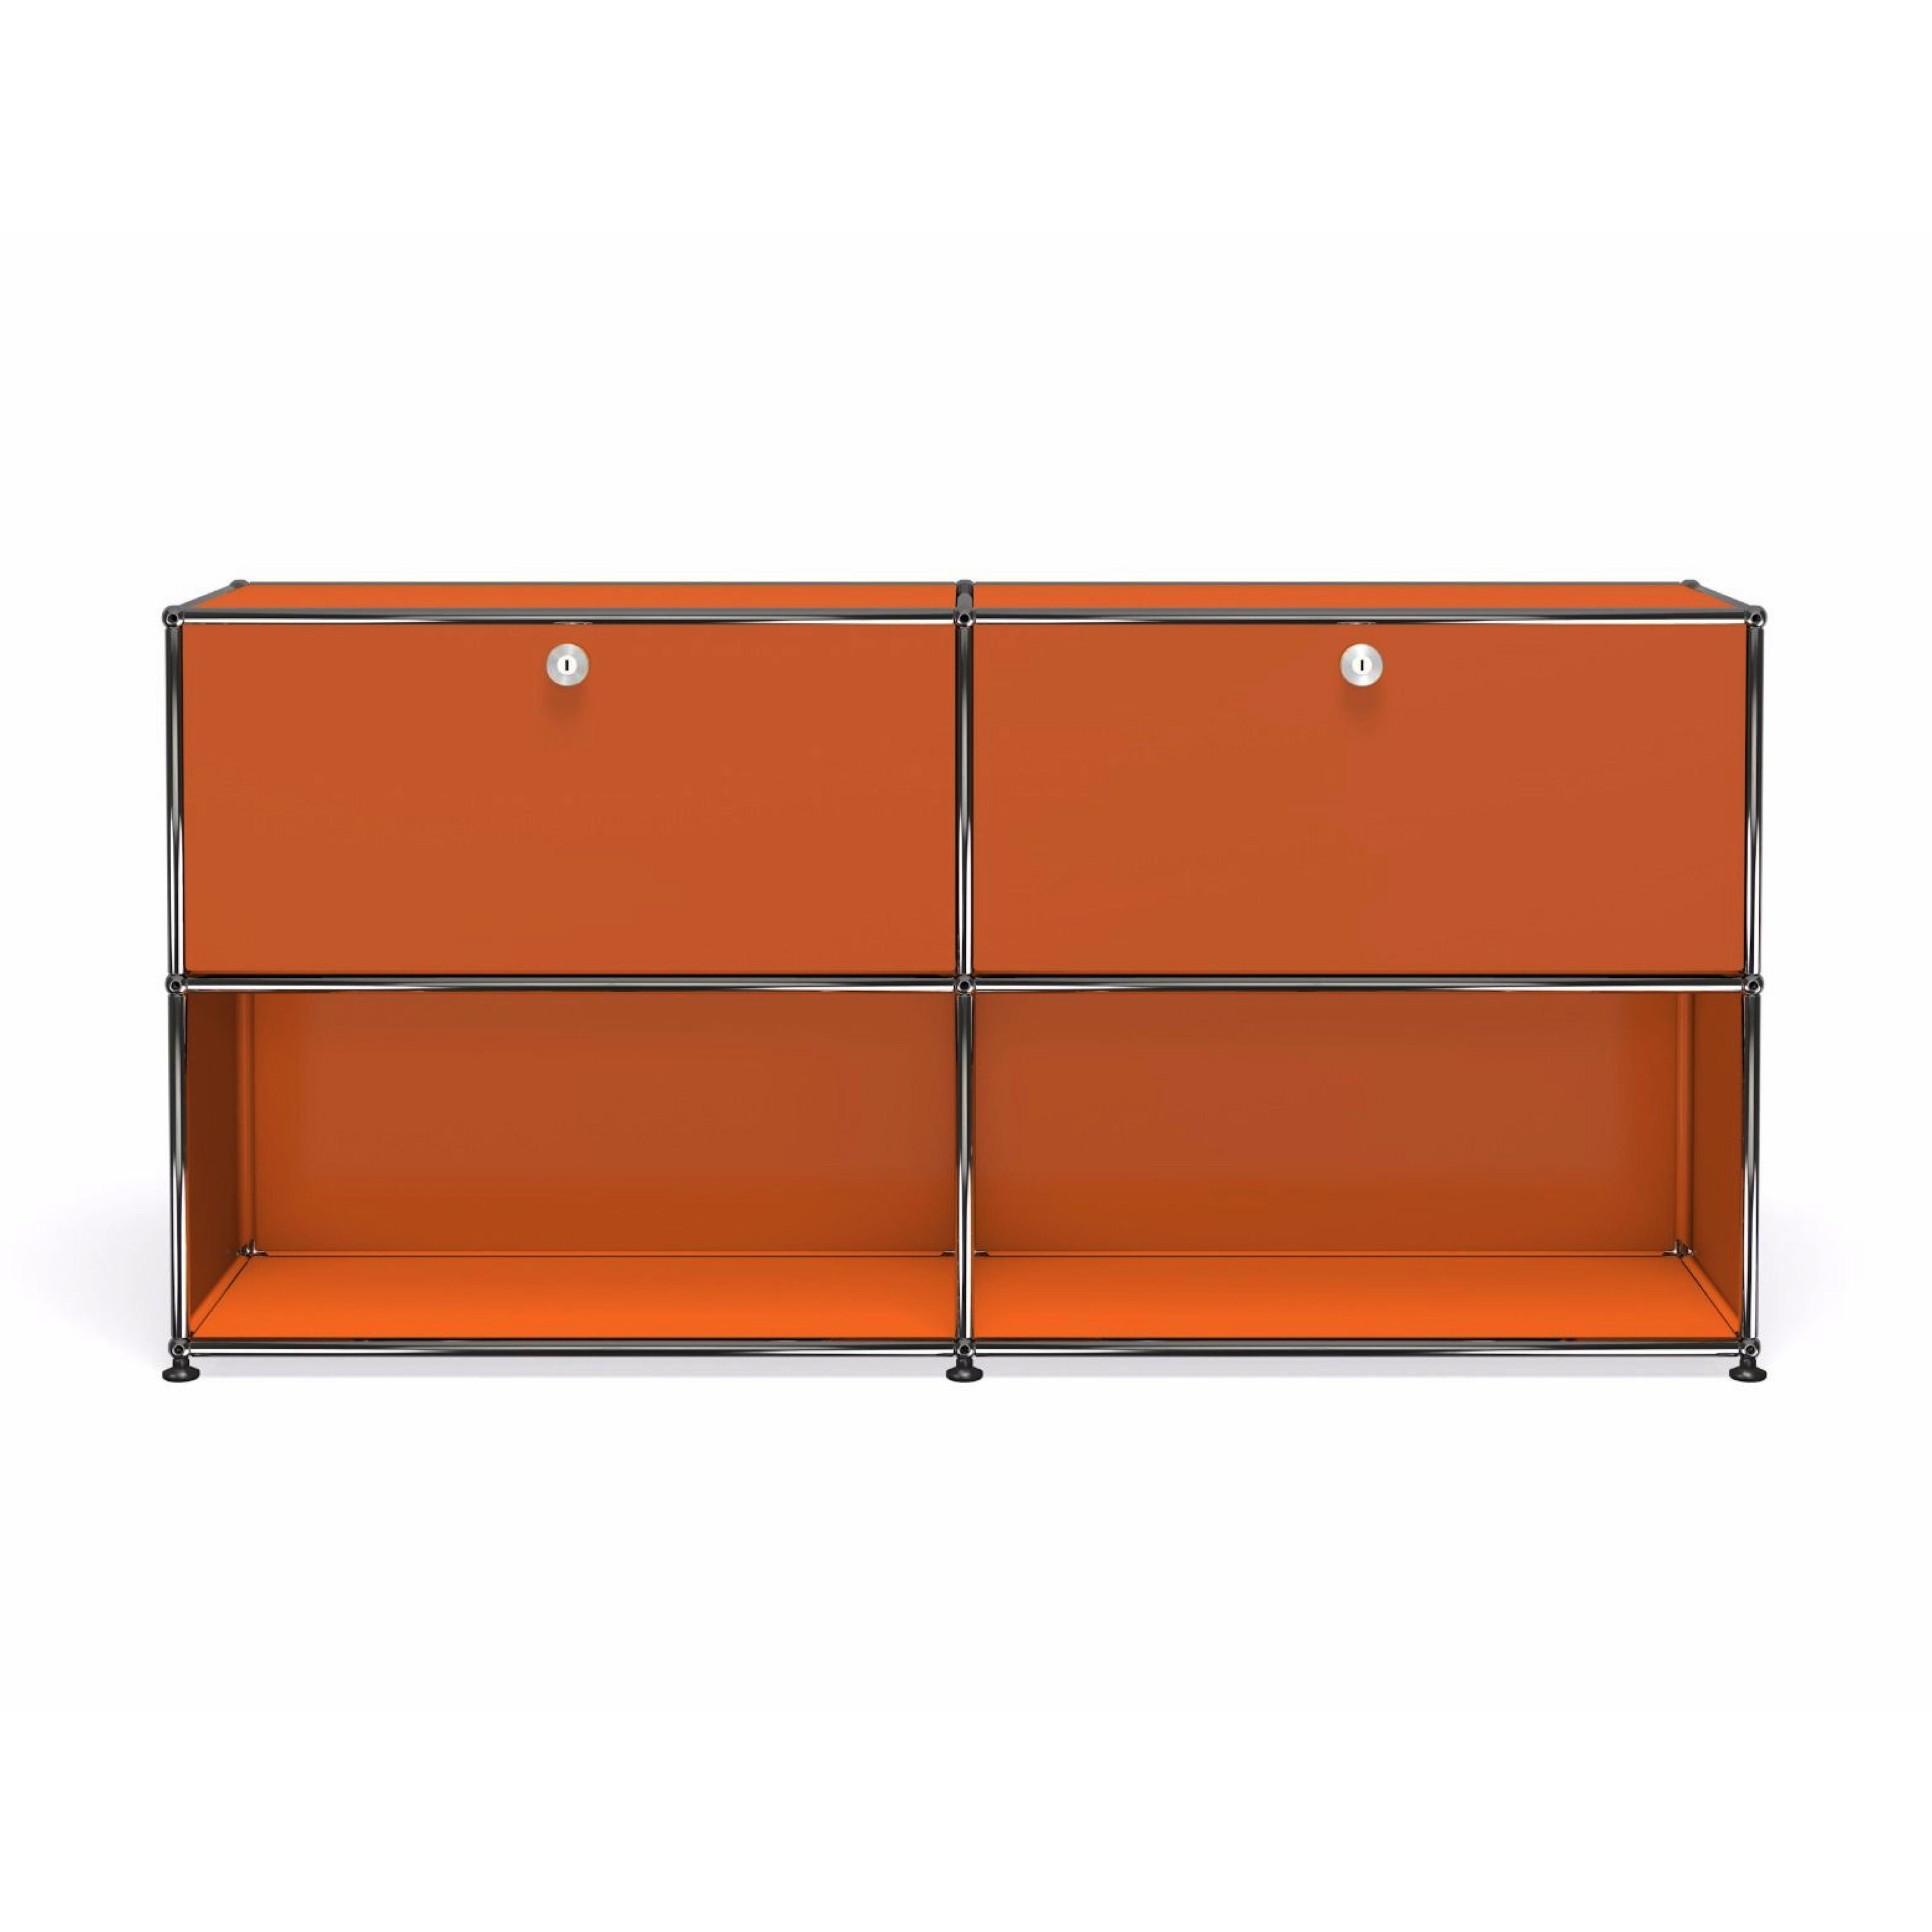 USM Haller Sideboard Orange LUXOR CLASSICS GmbH